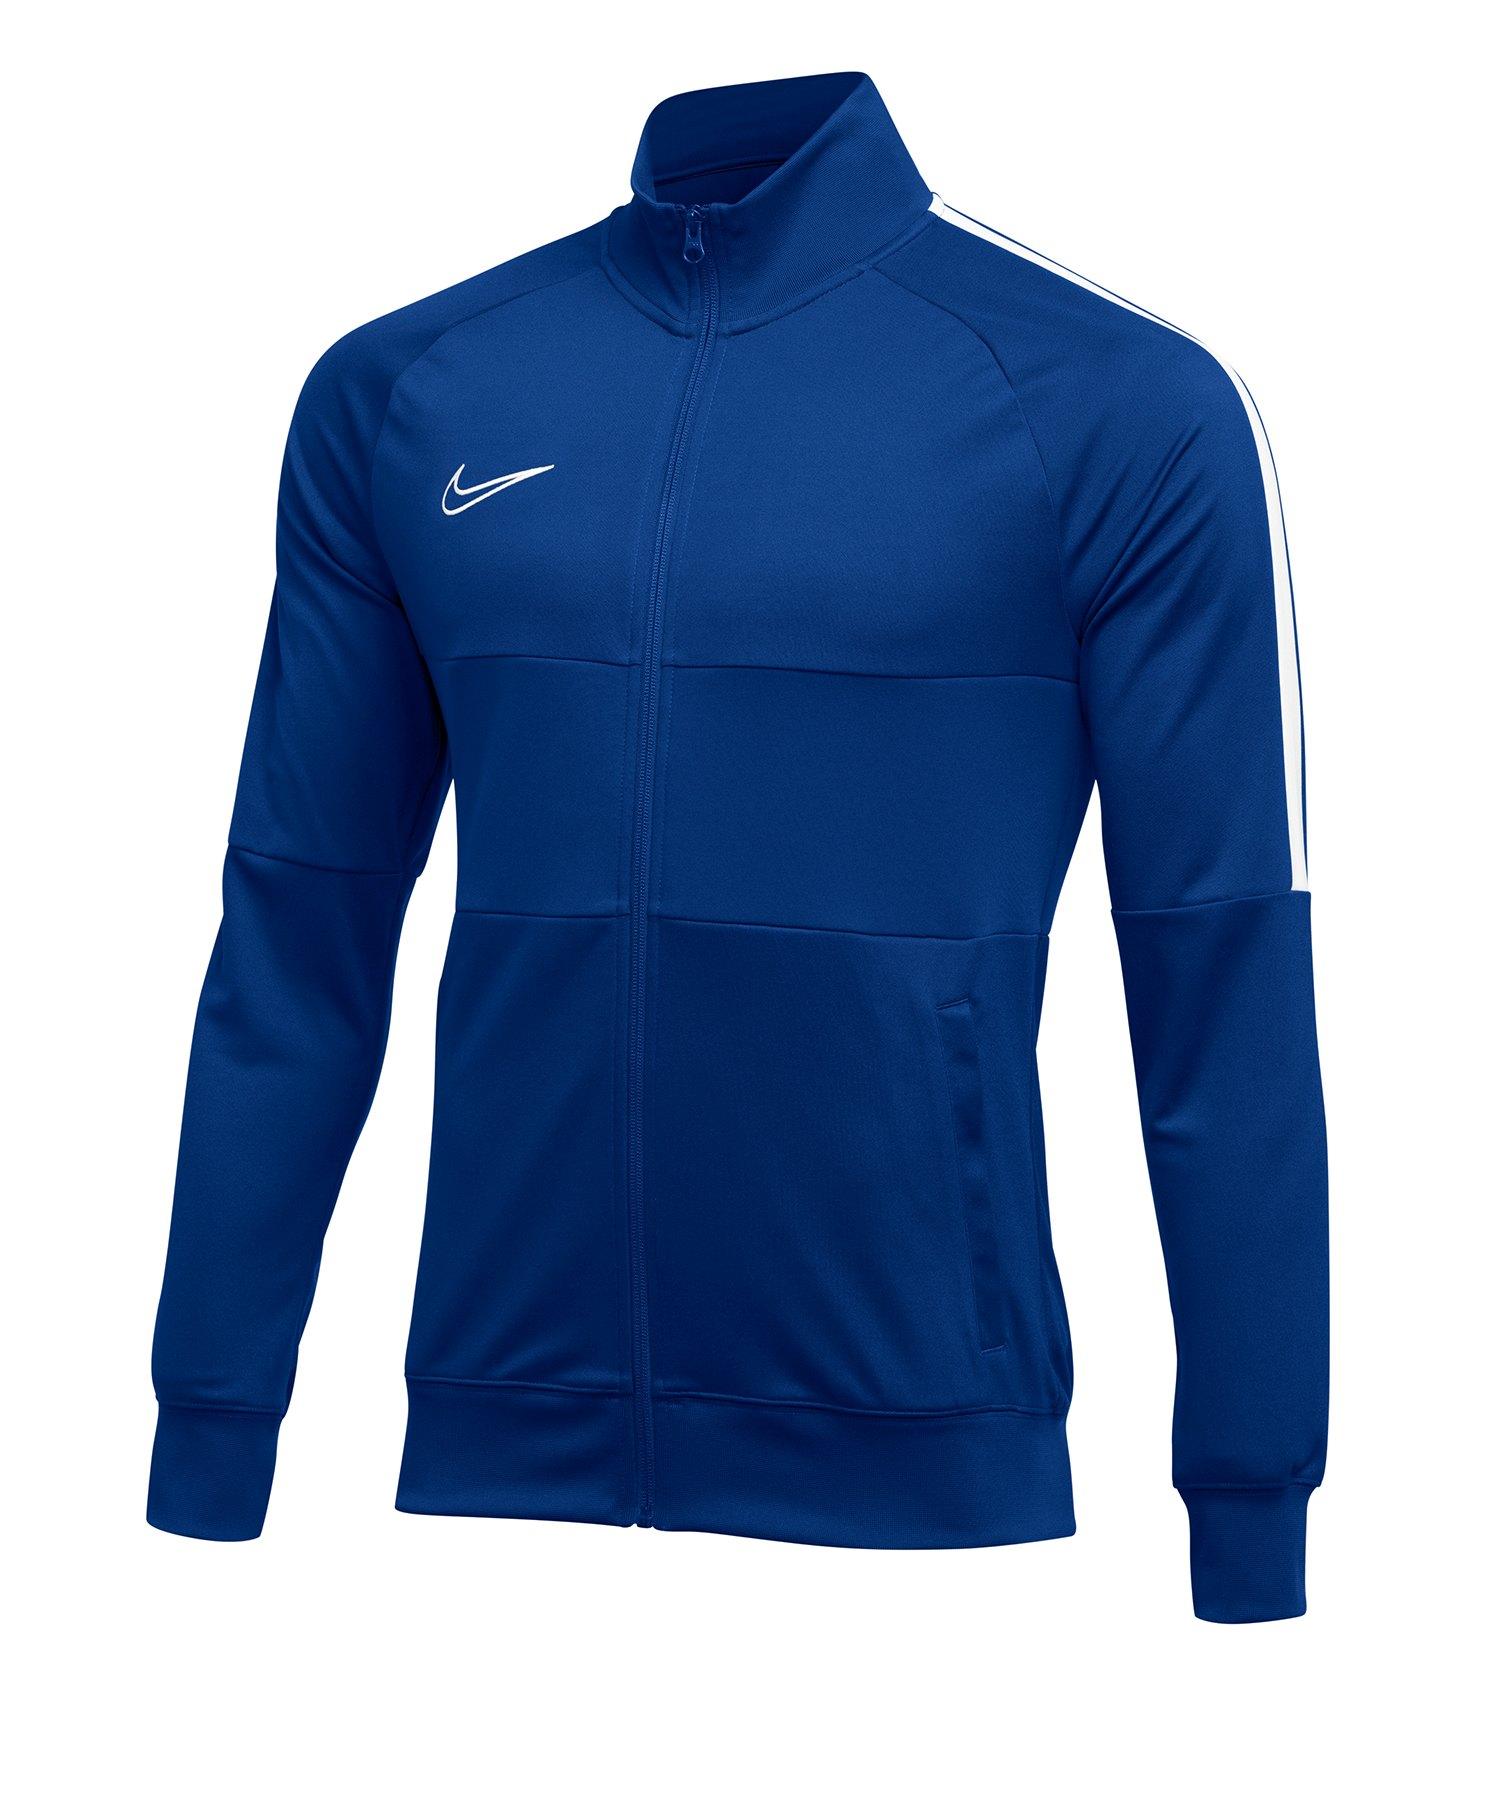 Nike Academy 19 Trainingsjacke Blau F463 - blau